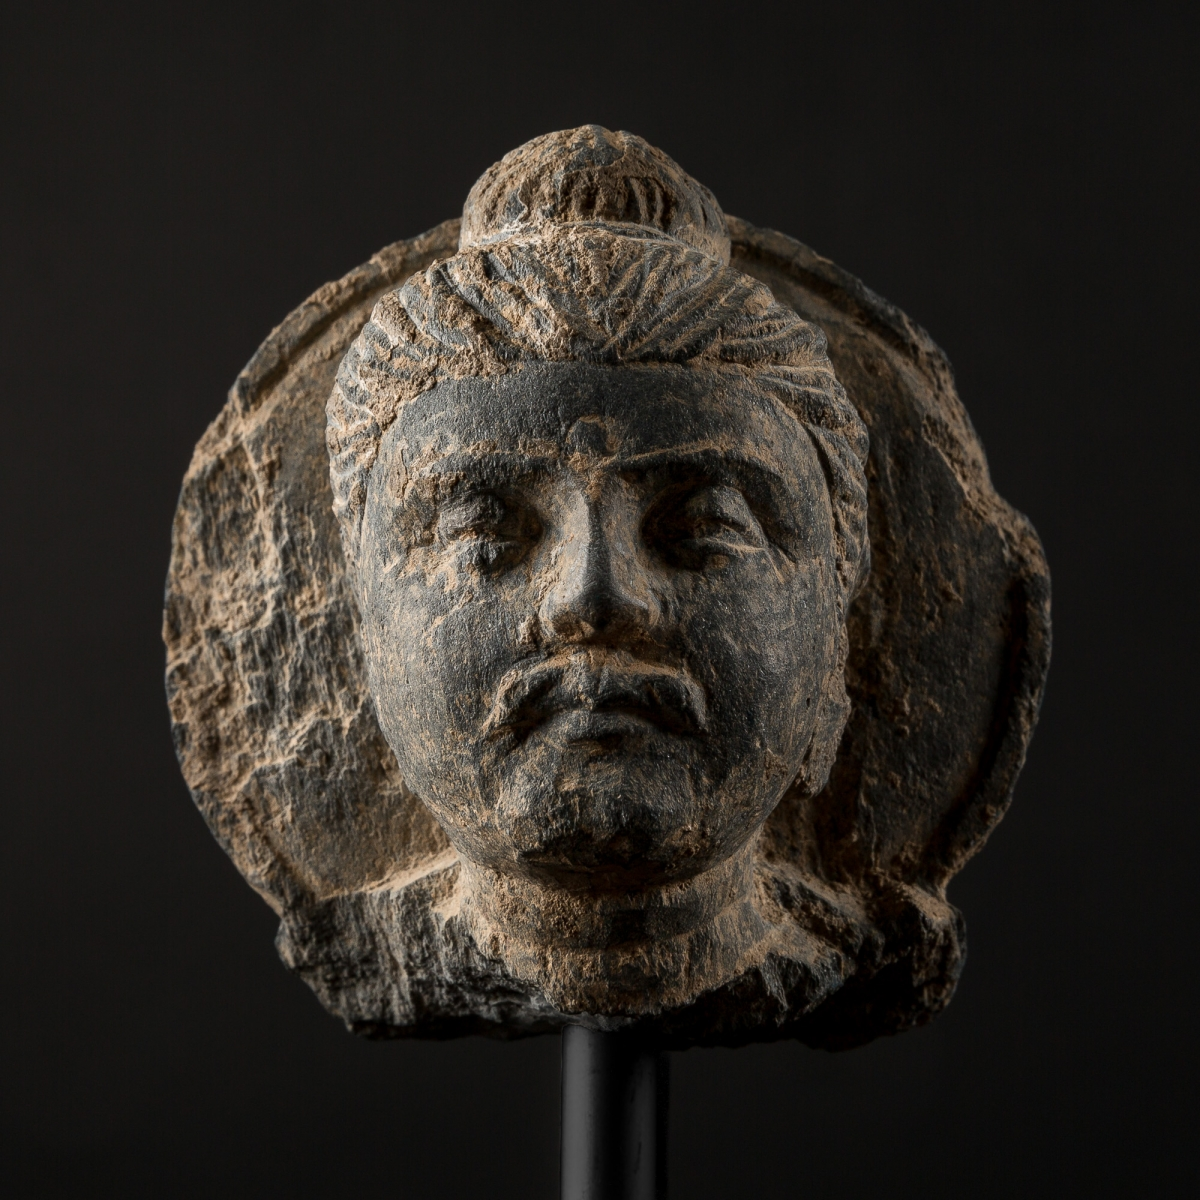 Photo of HALOED HEAD OF BUDDHA